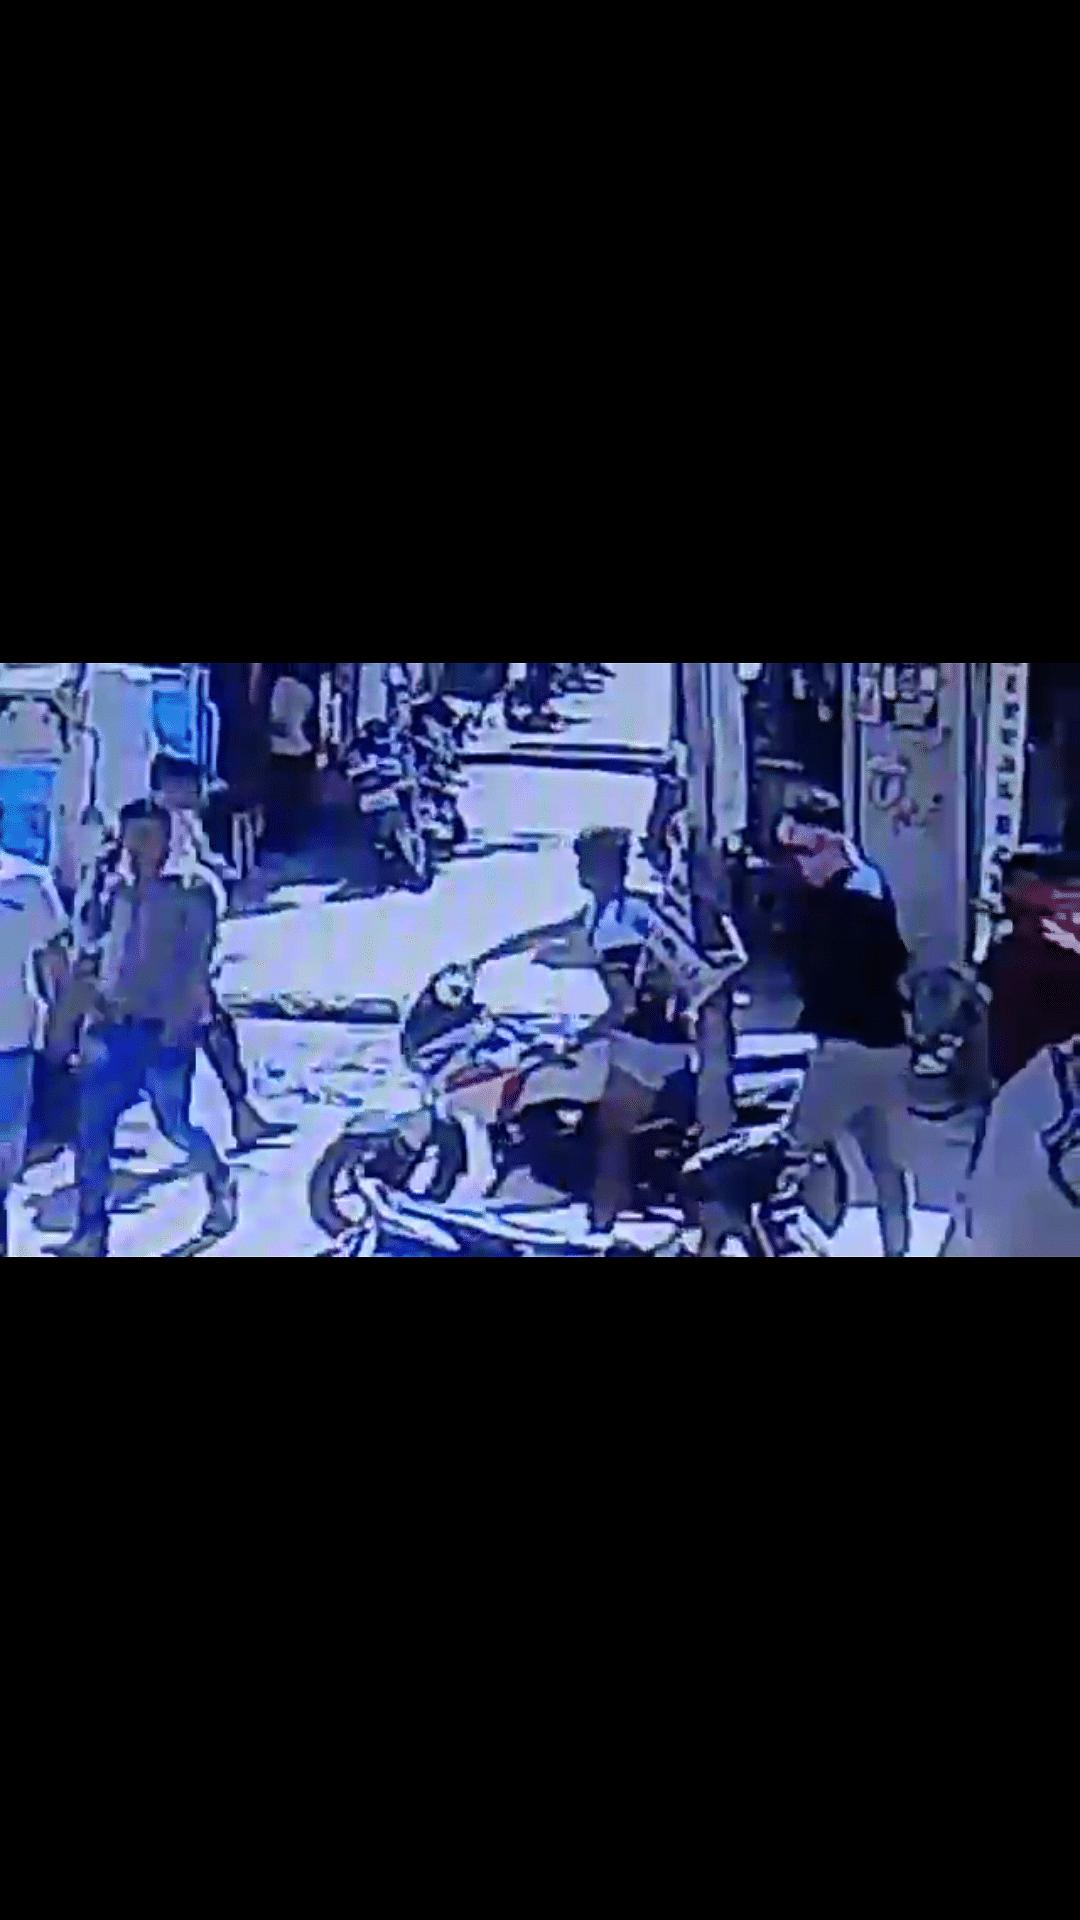 अपडेट.. मोबाइल दुकानदार से विवाद पर चली गोली